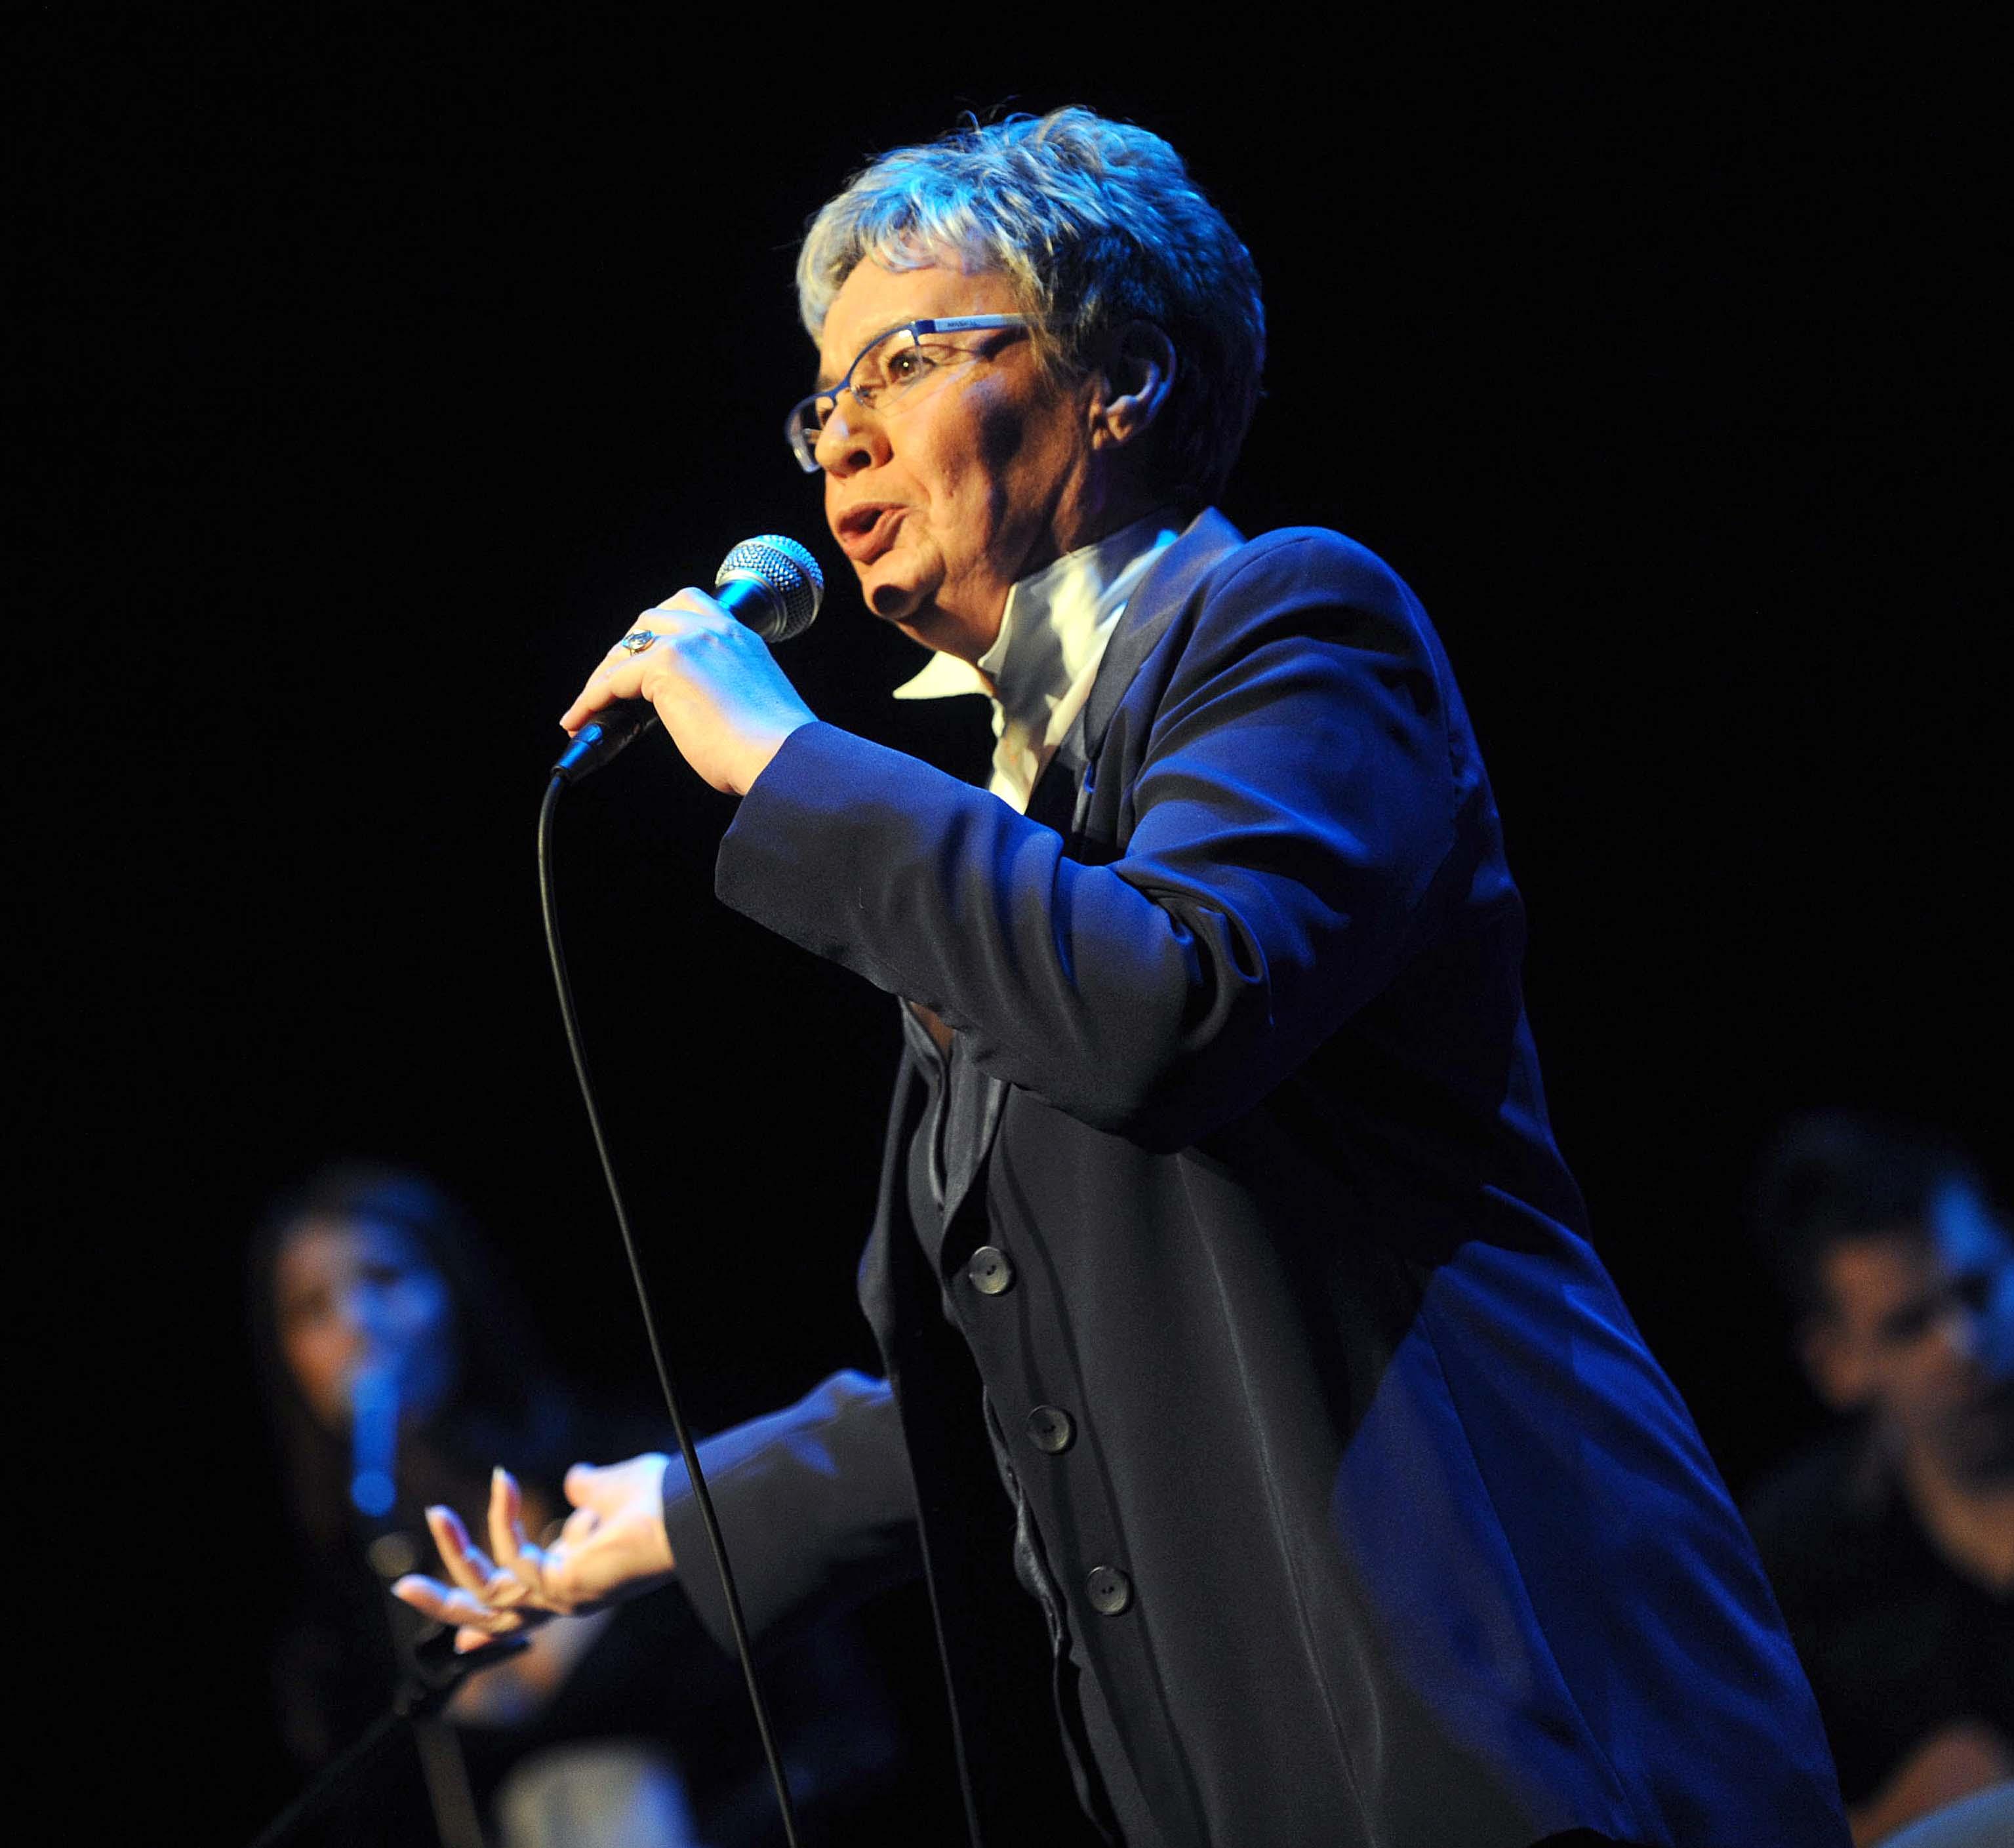 Mirjana Bobuš Održala Koncert Na Trsatskoj Gradini